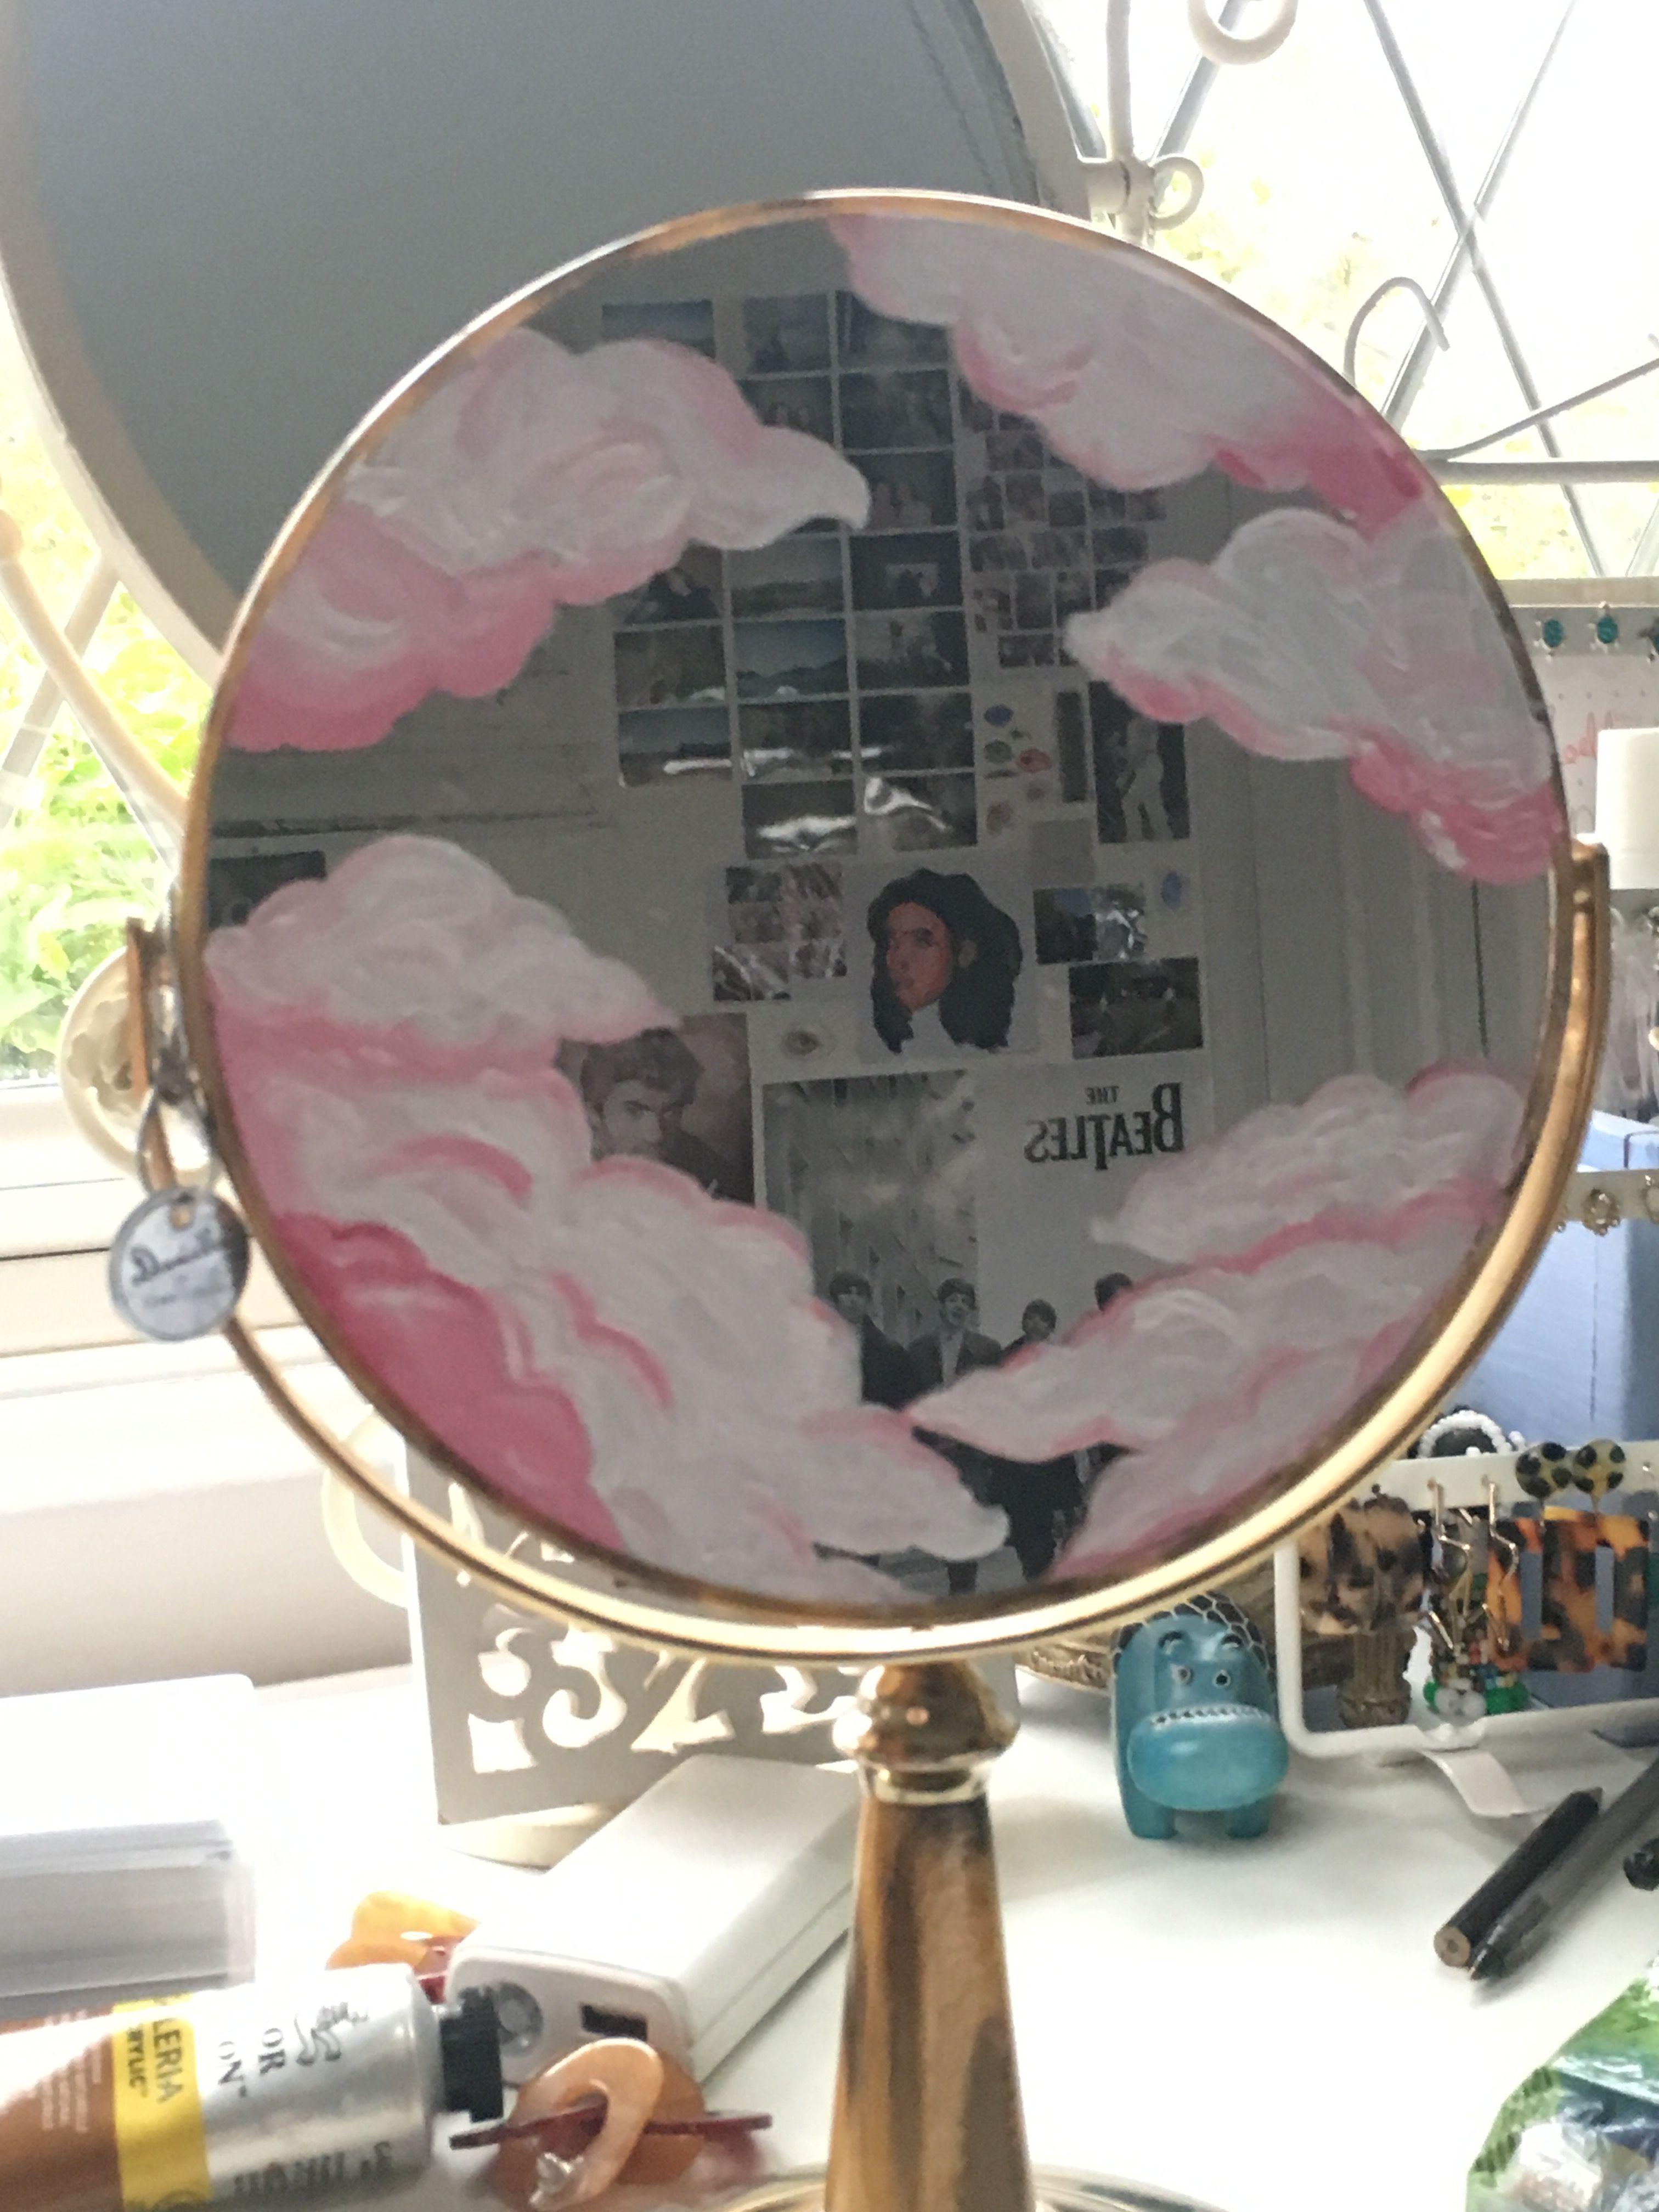 Mirror Mirrorselfie Mirroredfurniture Mirrorideas Mirrordecor Mirrorpic Mirrorphotography Mirror Mirror Painting Painting Art Projects Small Canvas Art